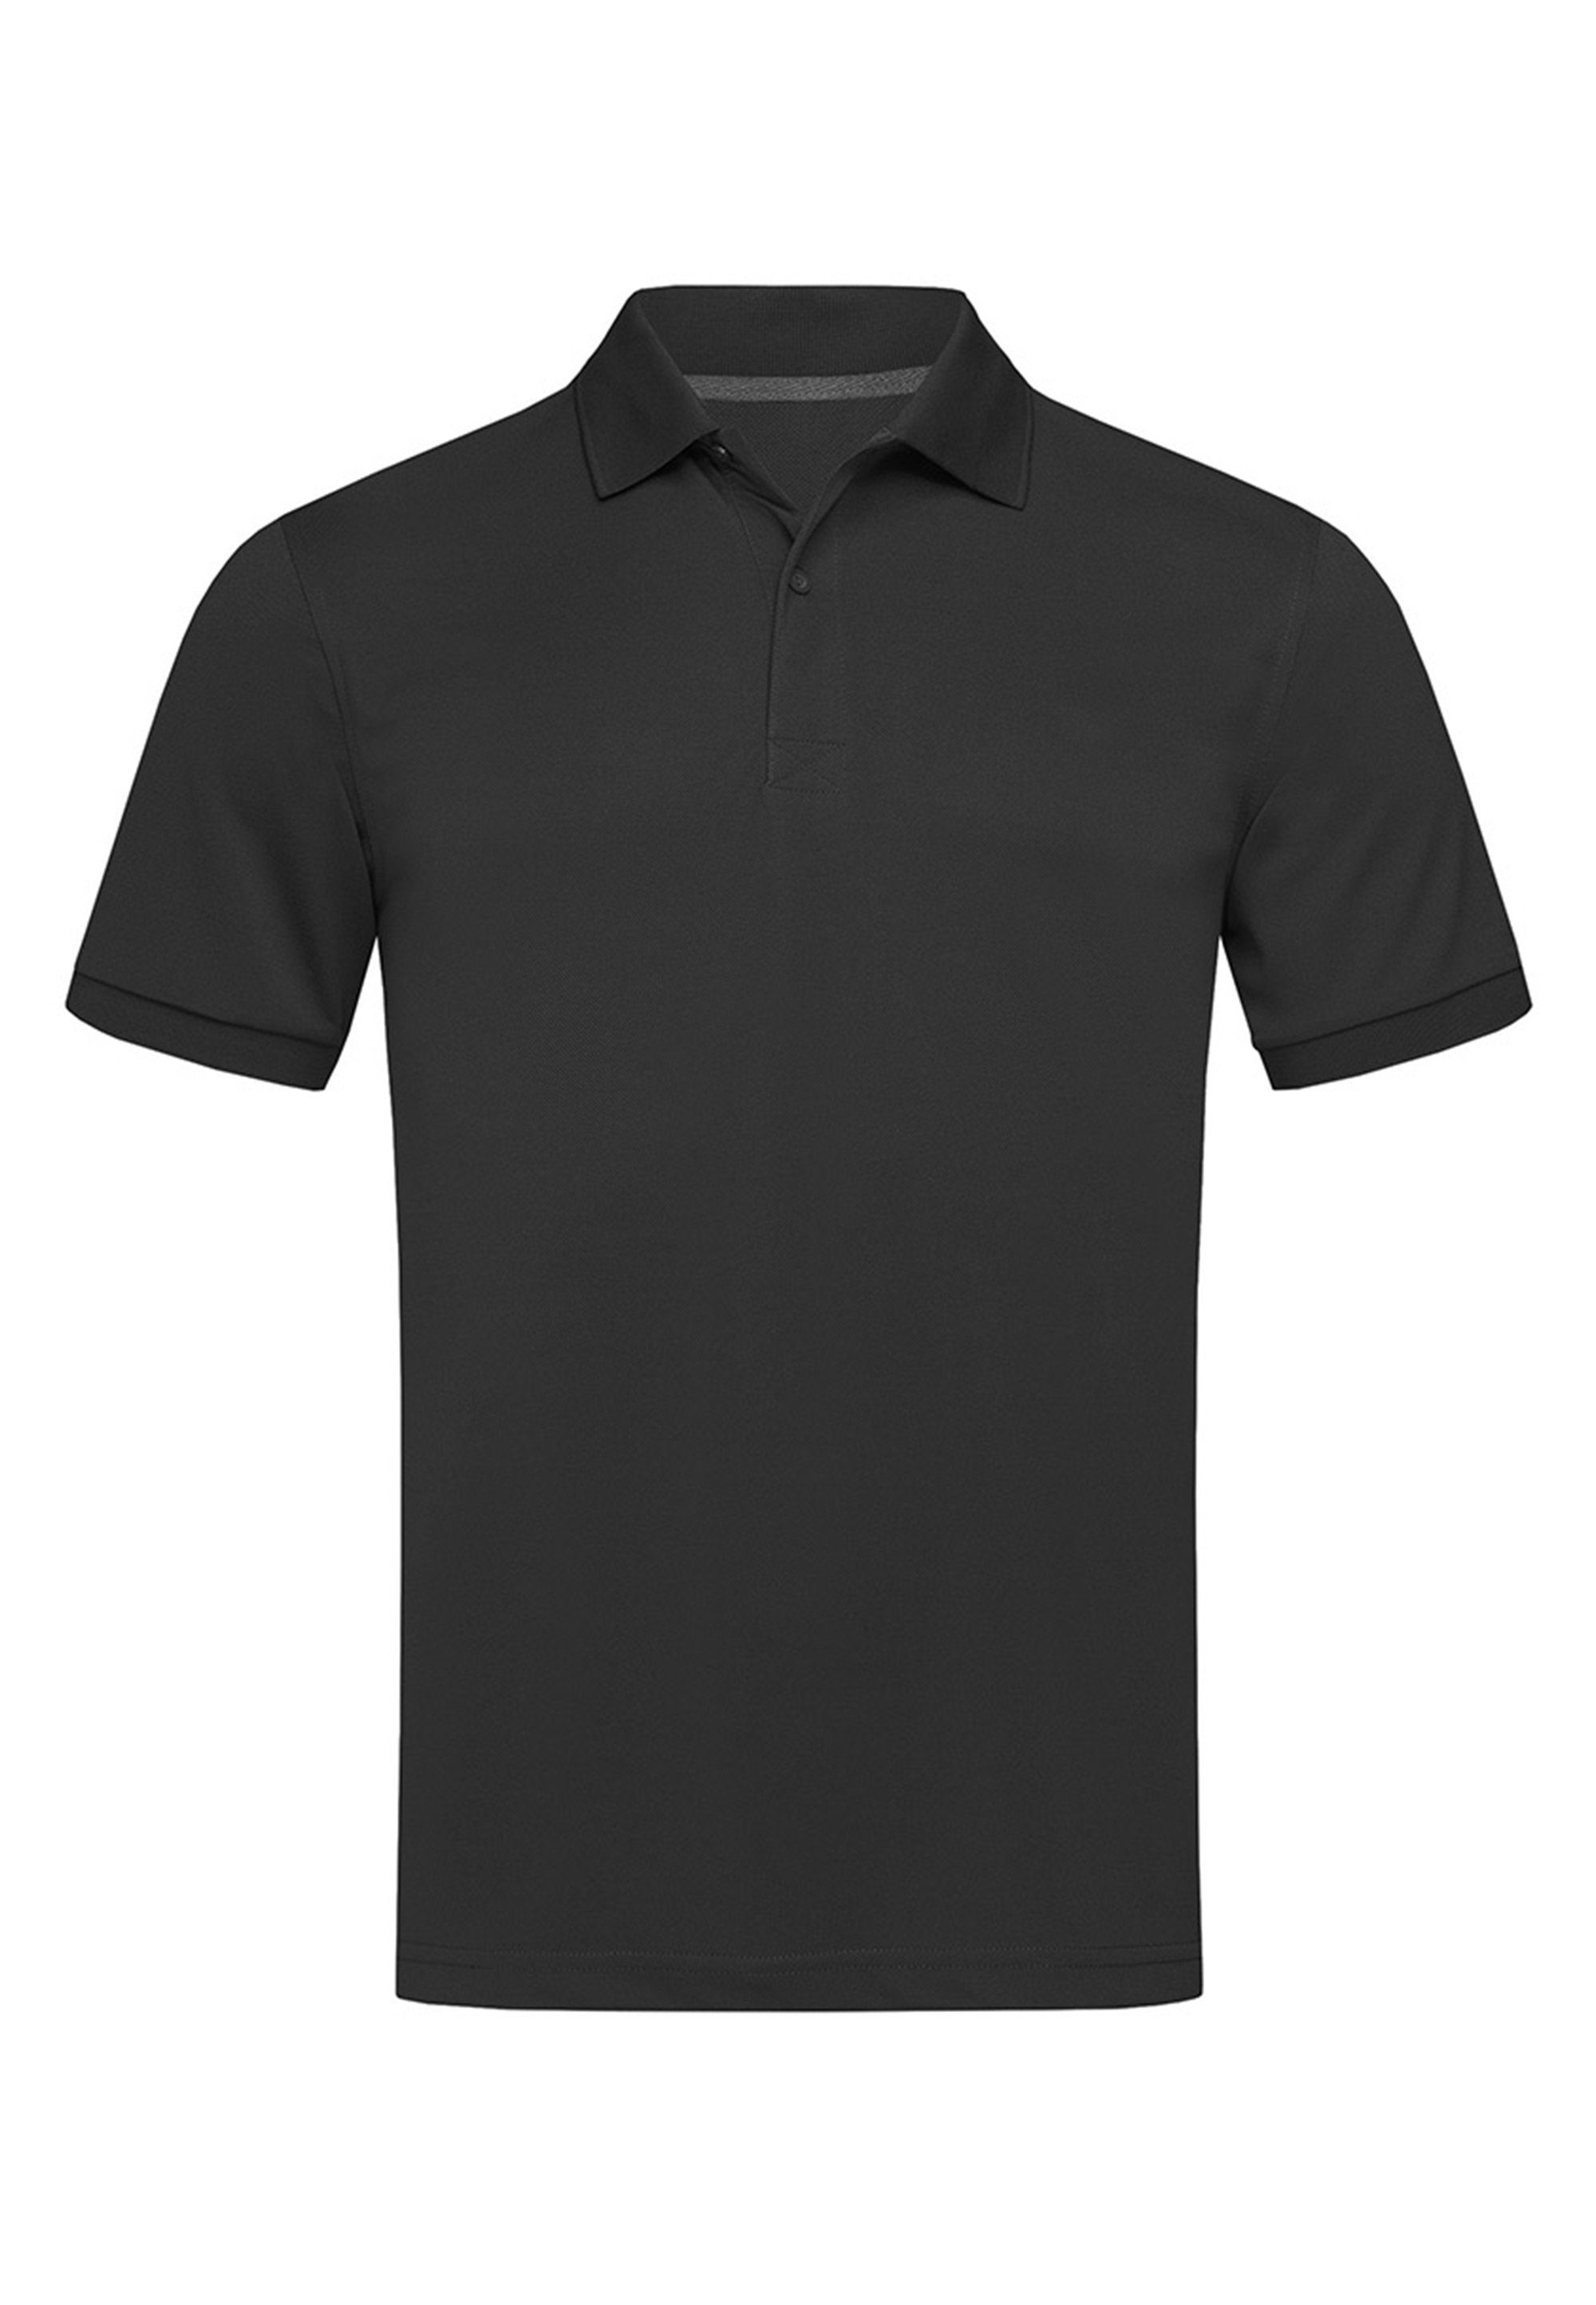 Poloshirt Poloshirt Funktion Stedman Atmungsaktiver Mit Stedman Funktion Mit Atmungsaktiver Poloshirt Stedman LqSMzpUVG